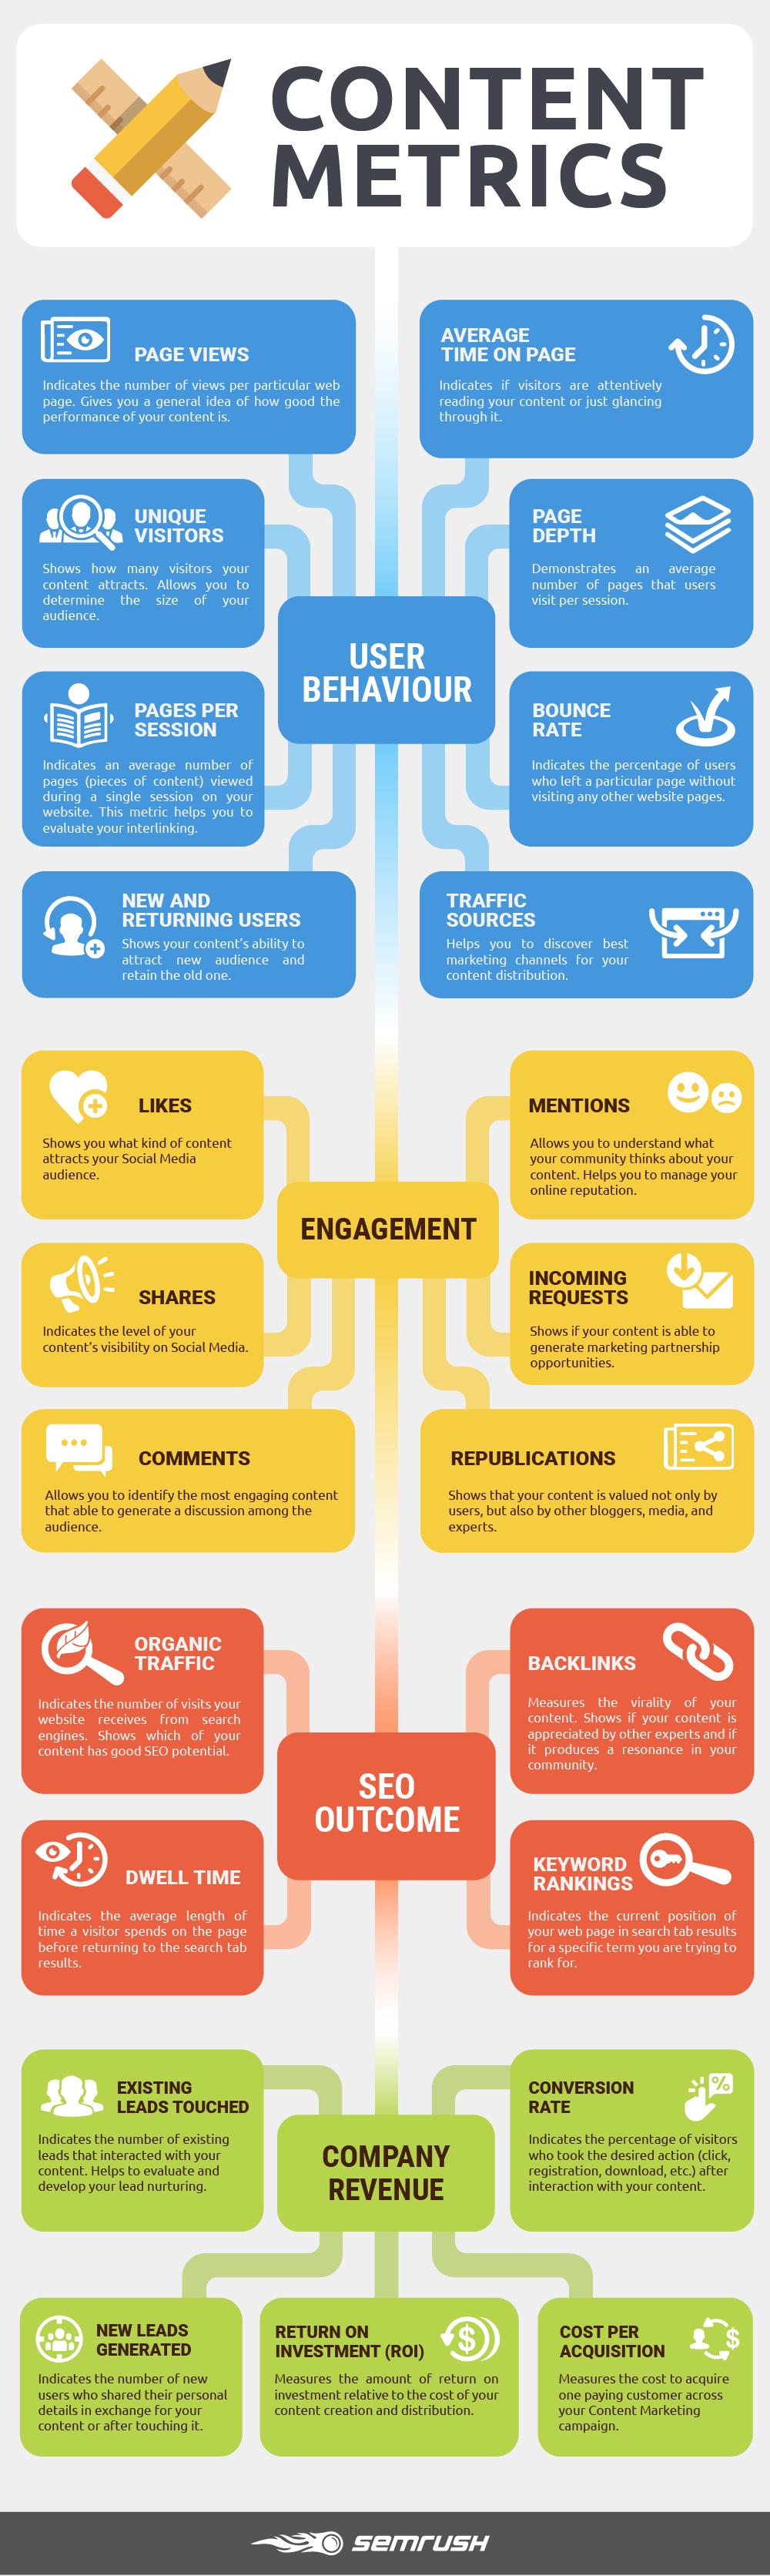 Content Metrics Infographic - SEMrush